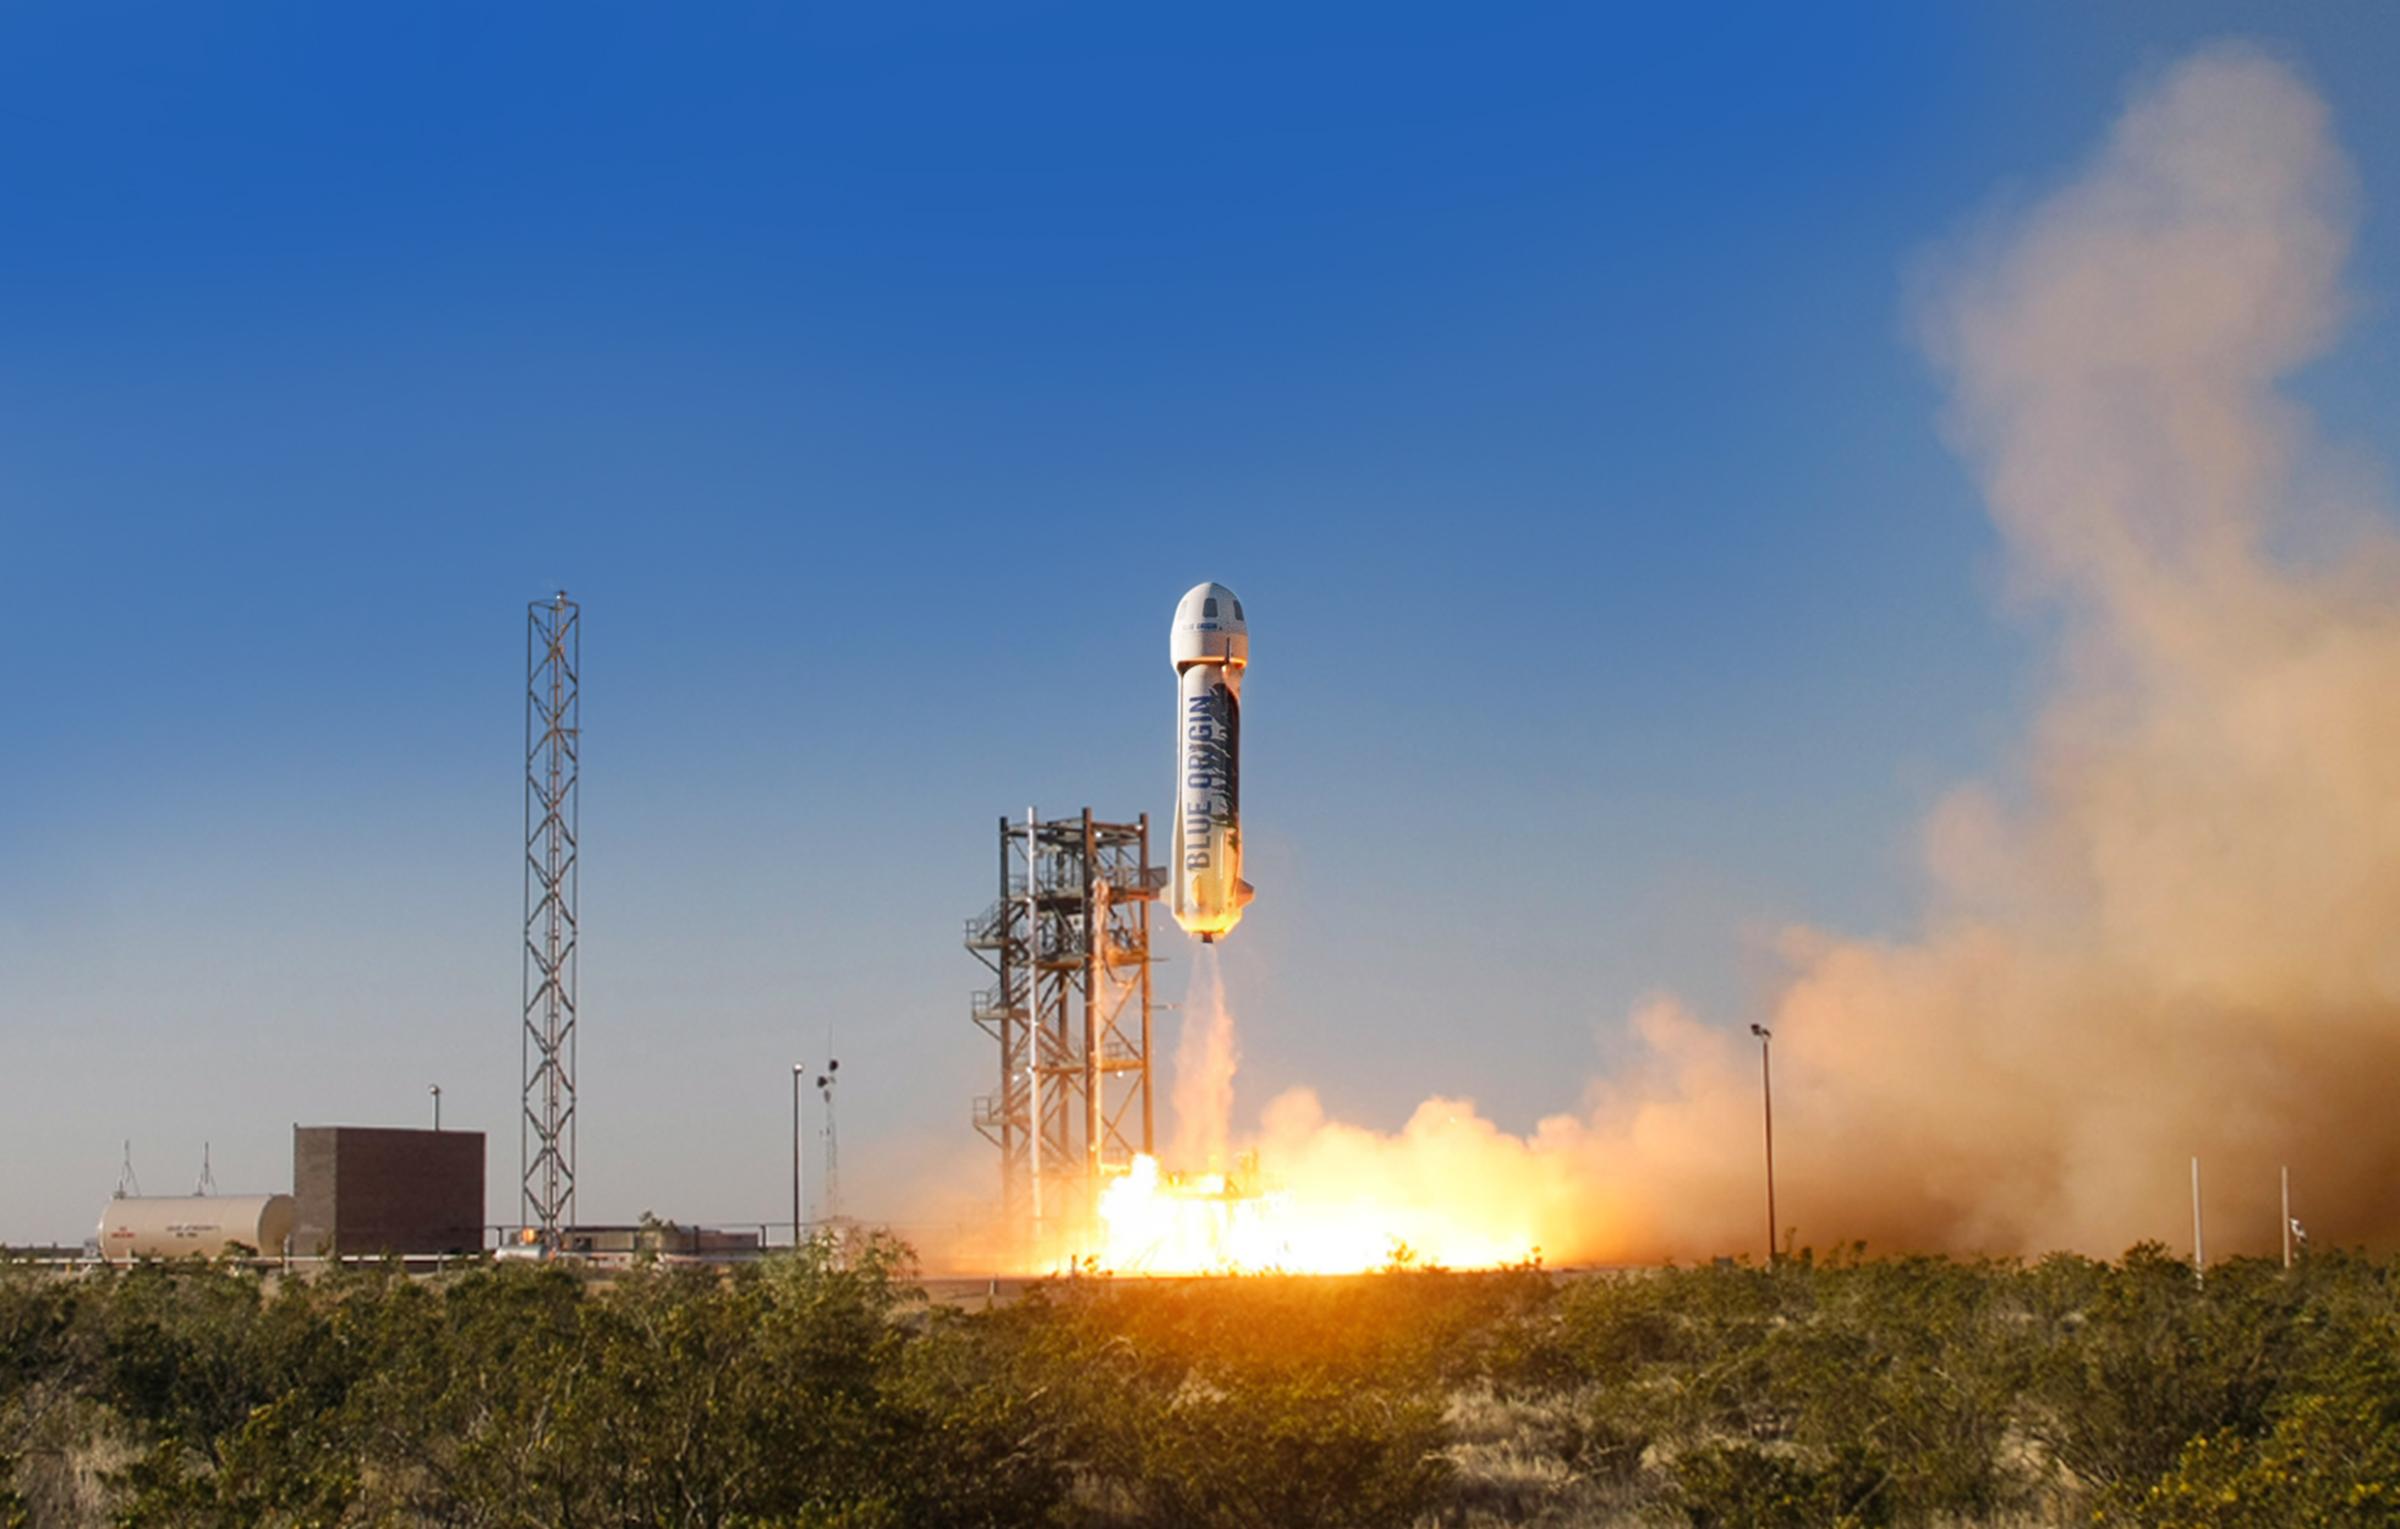 Blue Origin's New Shepard space vehicle. Image credit: Blue Origin